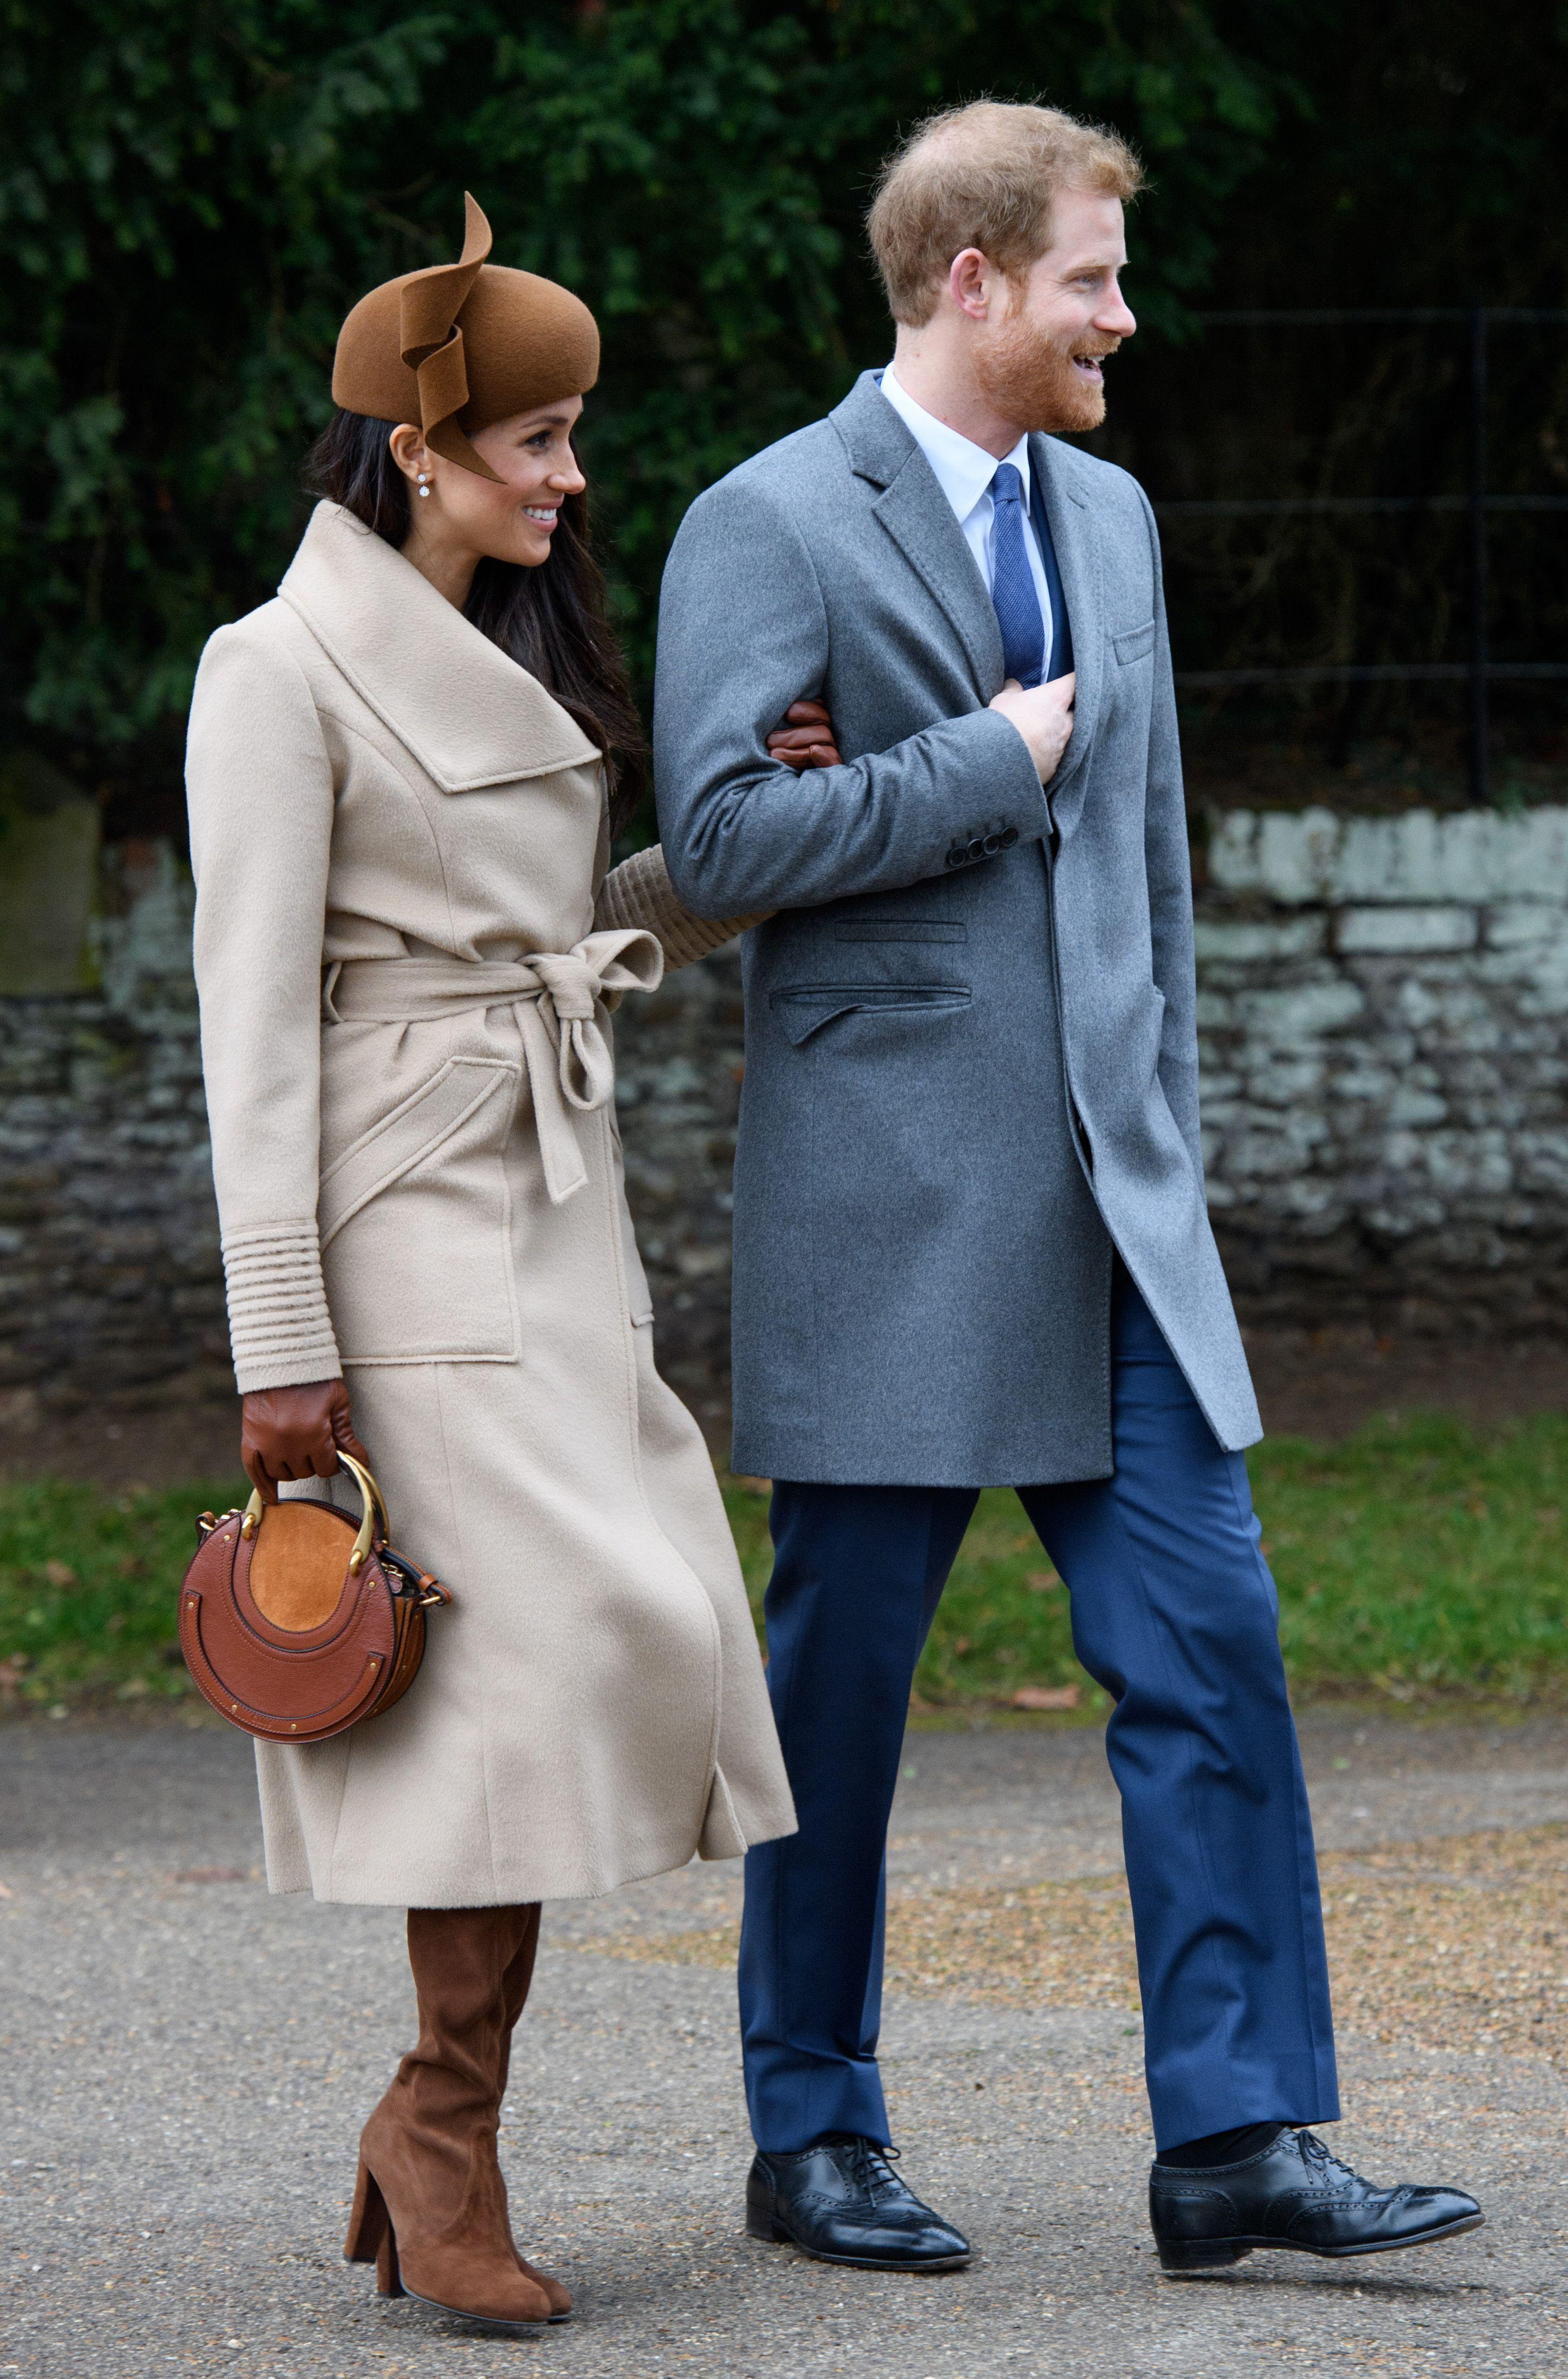 Meghan Markle and Prince HarryChristmas Day church service, Sandringham, Norfolk, UK - 25 Dec 2017